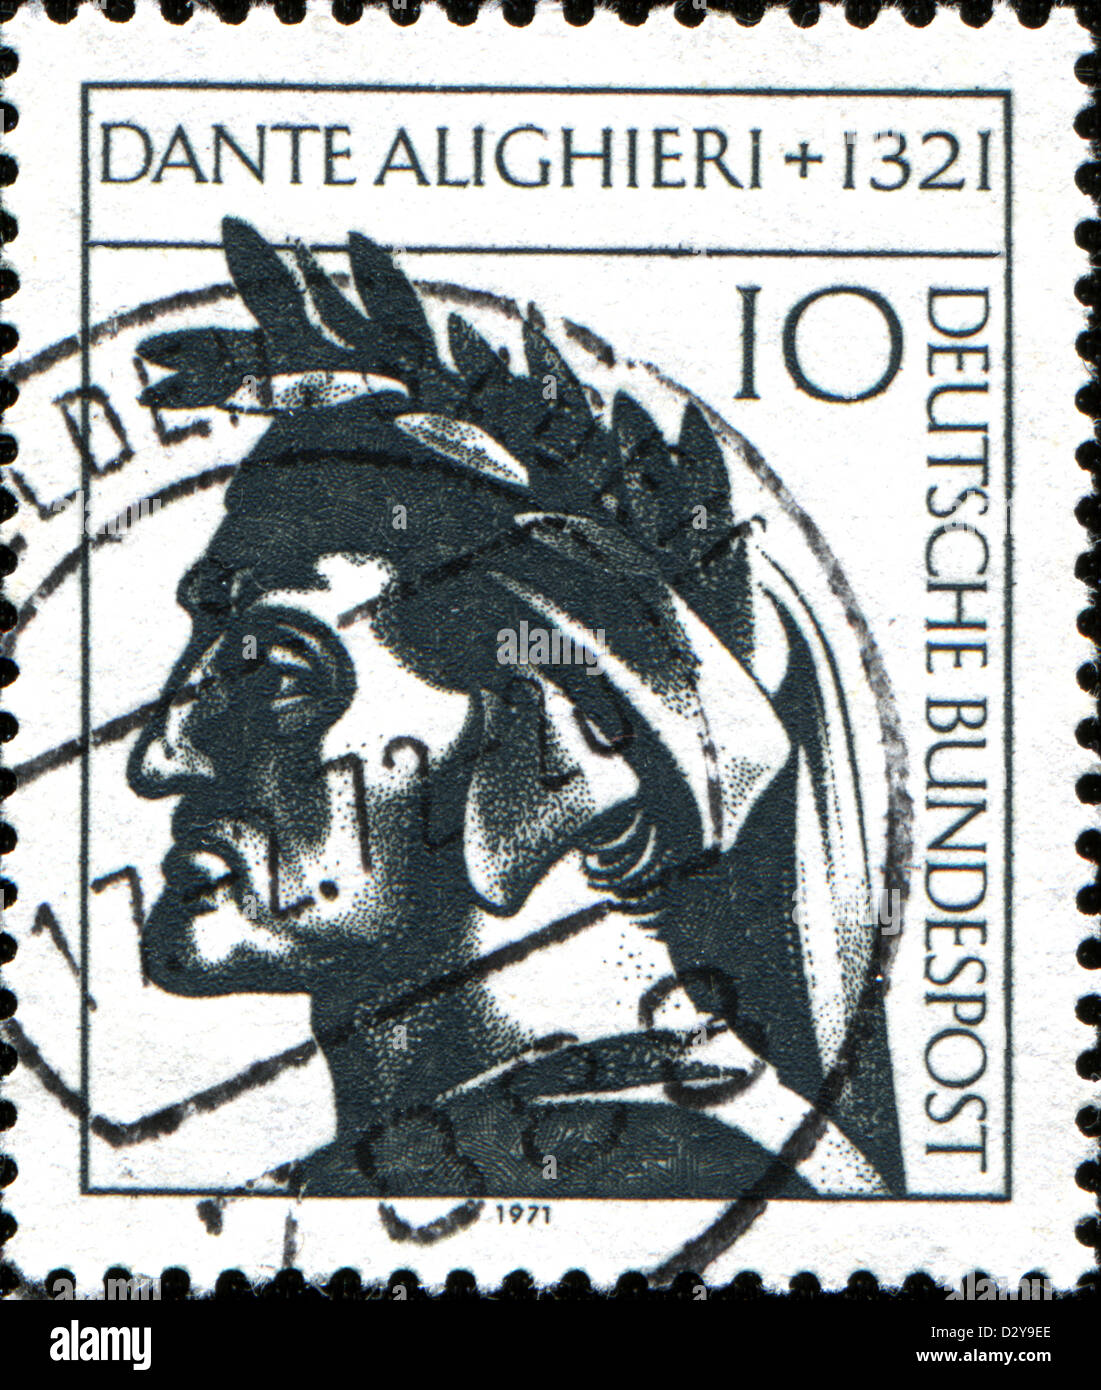 GERMANY - CIRCA 1971: A stamp printed in Germany shows Dante Alighieri, Italian Poet, circa 1971 - Stock Image